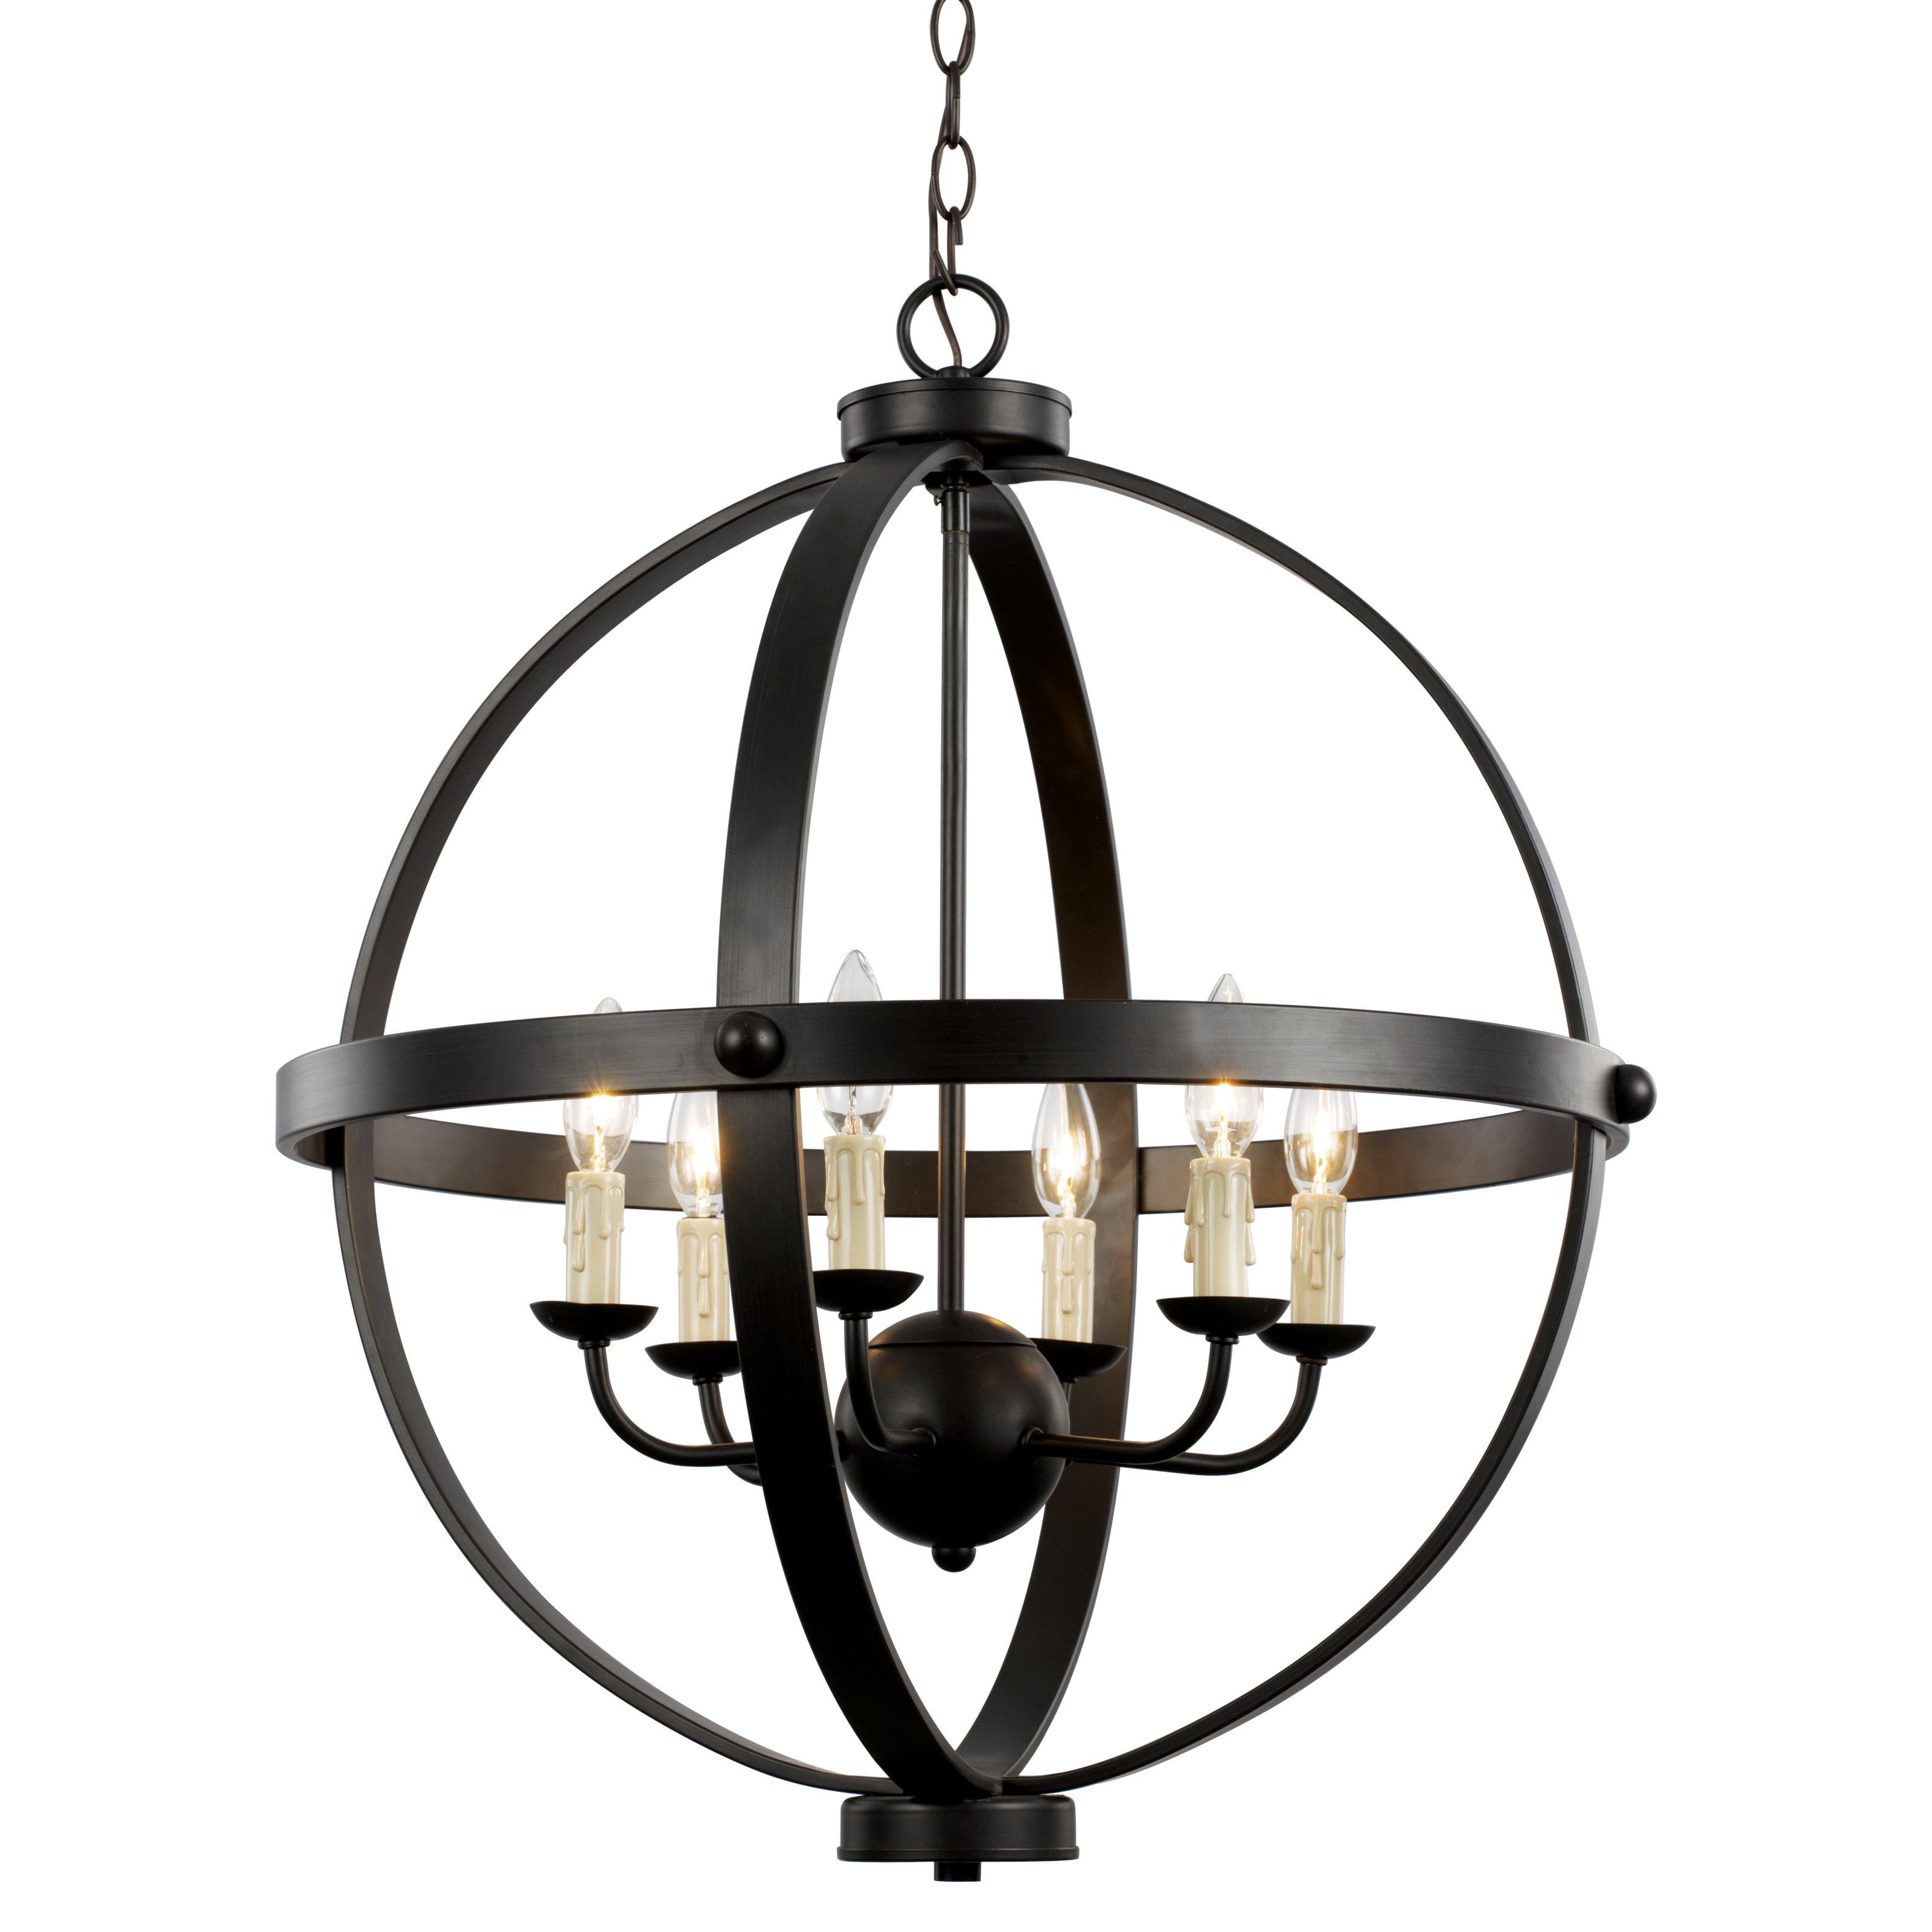 old world chandelier - Sphere Chandelier